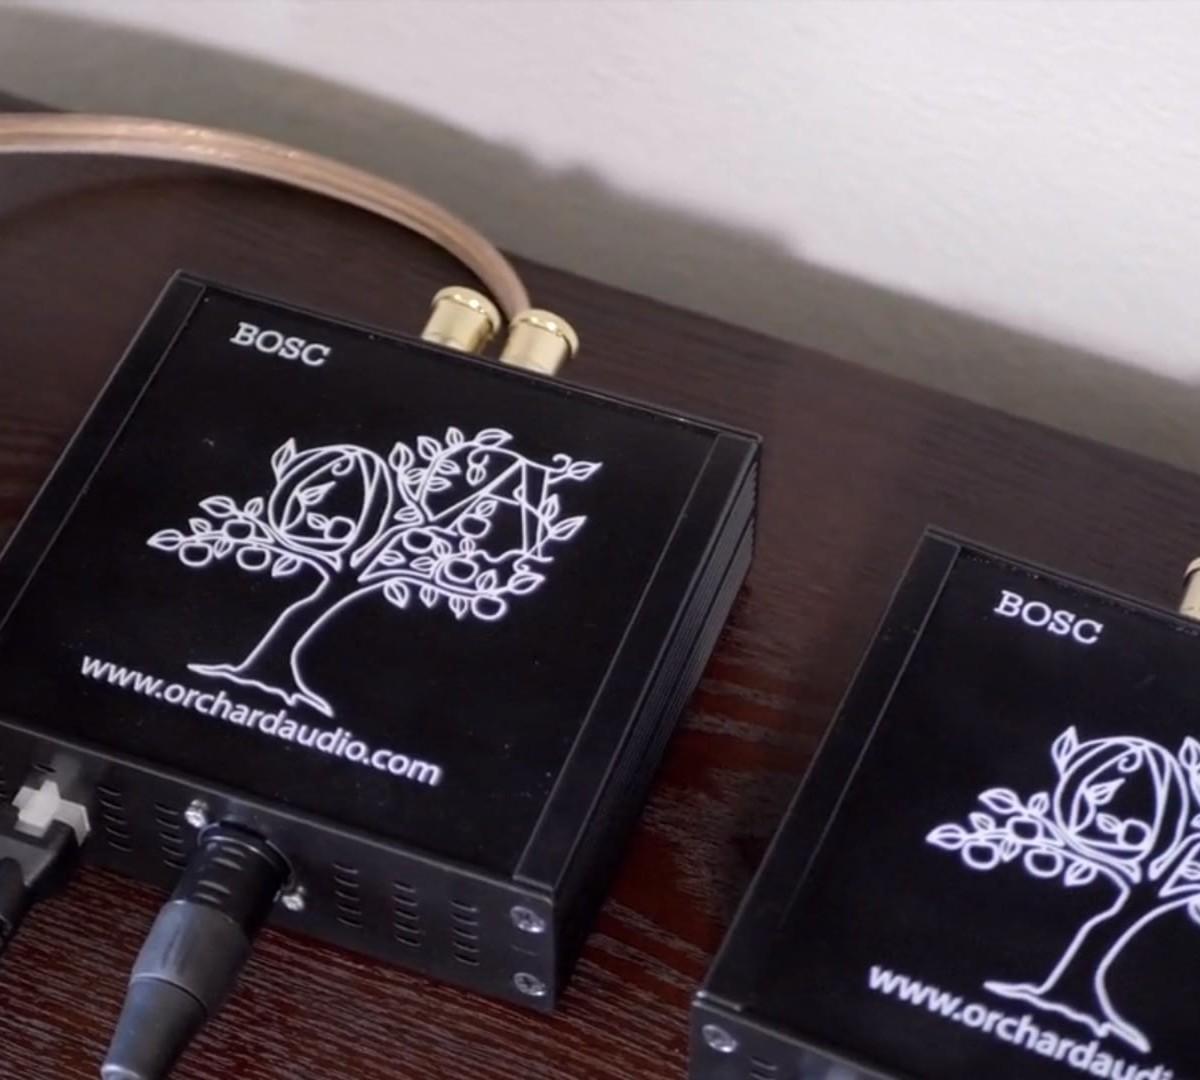 BOSC Monoblock GaN Audio Amplifier will instantly improve your audio